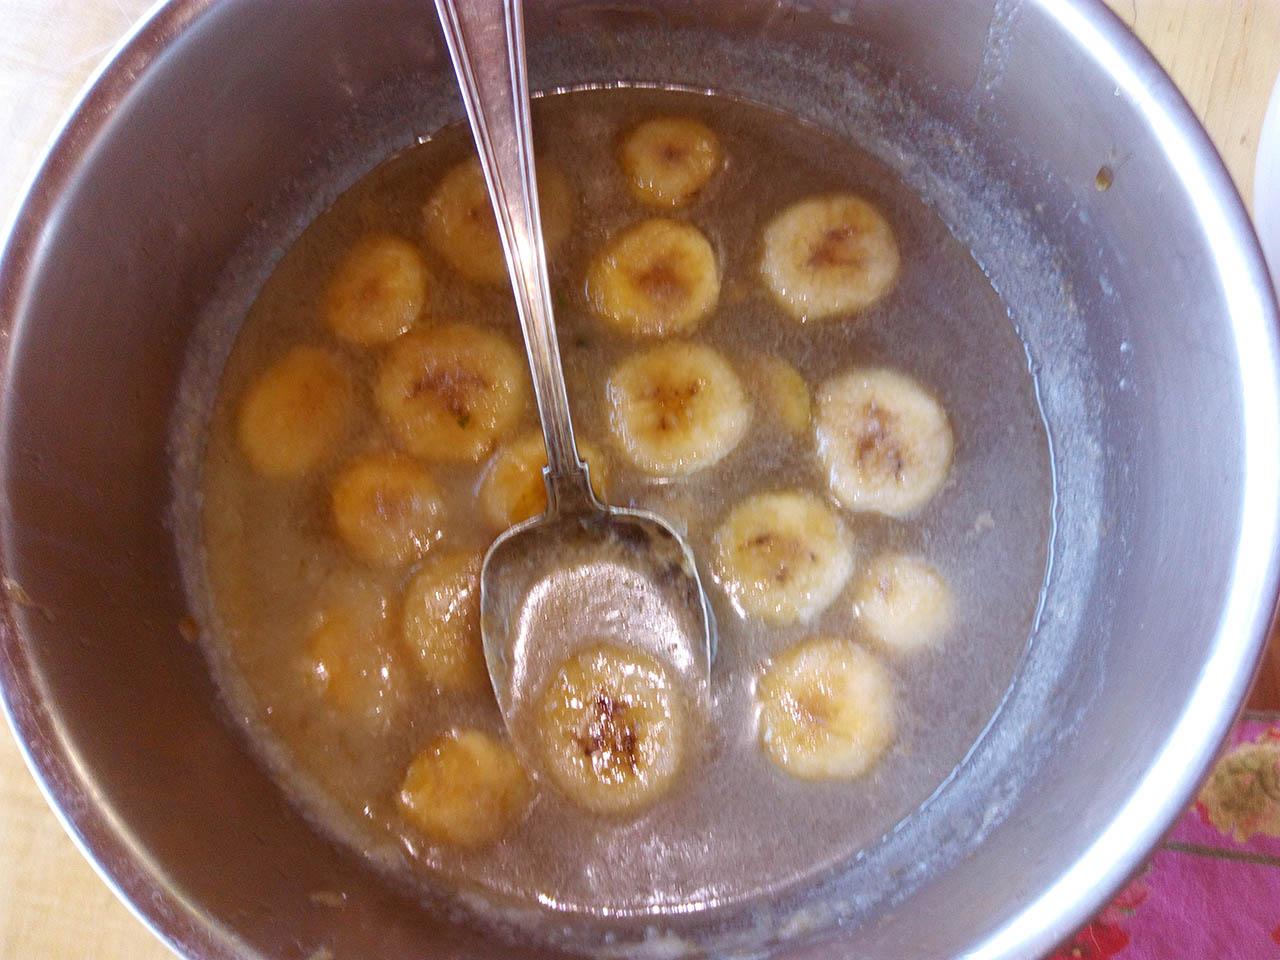 Fried bananas.